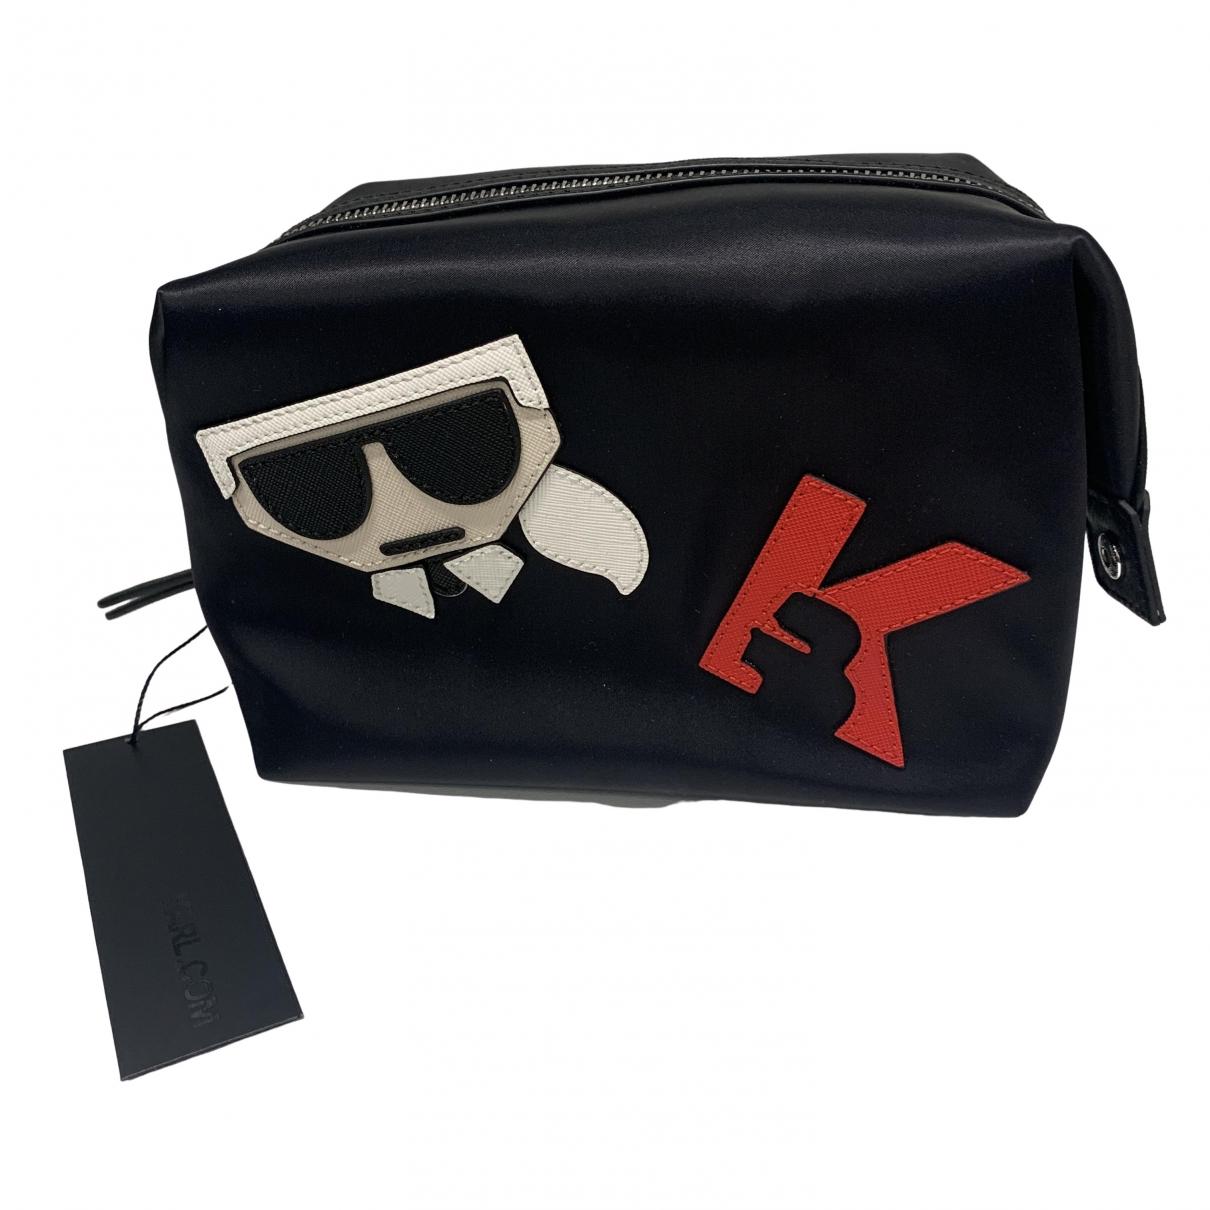 Bolsos clutch en Poliester Negro Karl Lagerfeld